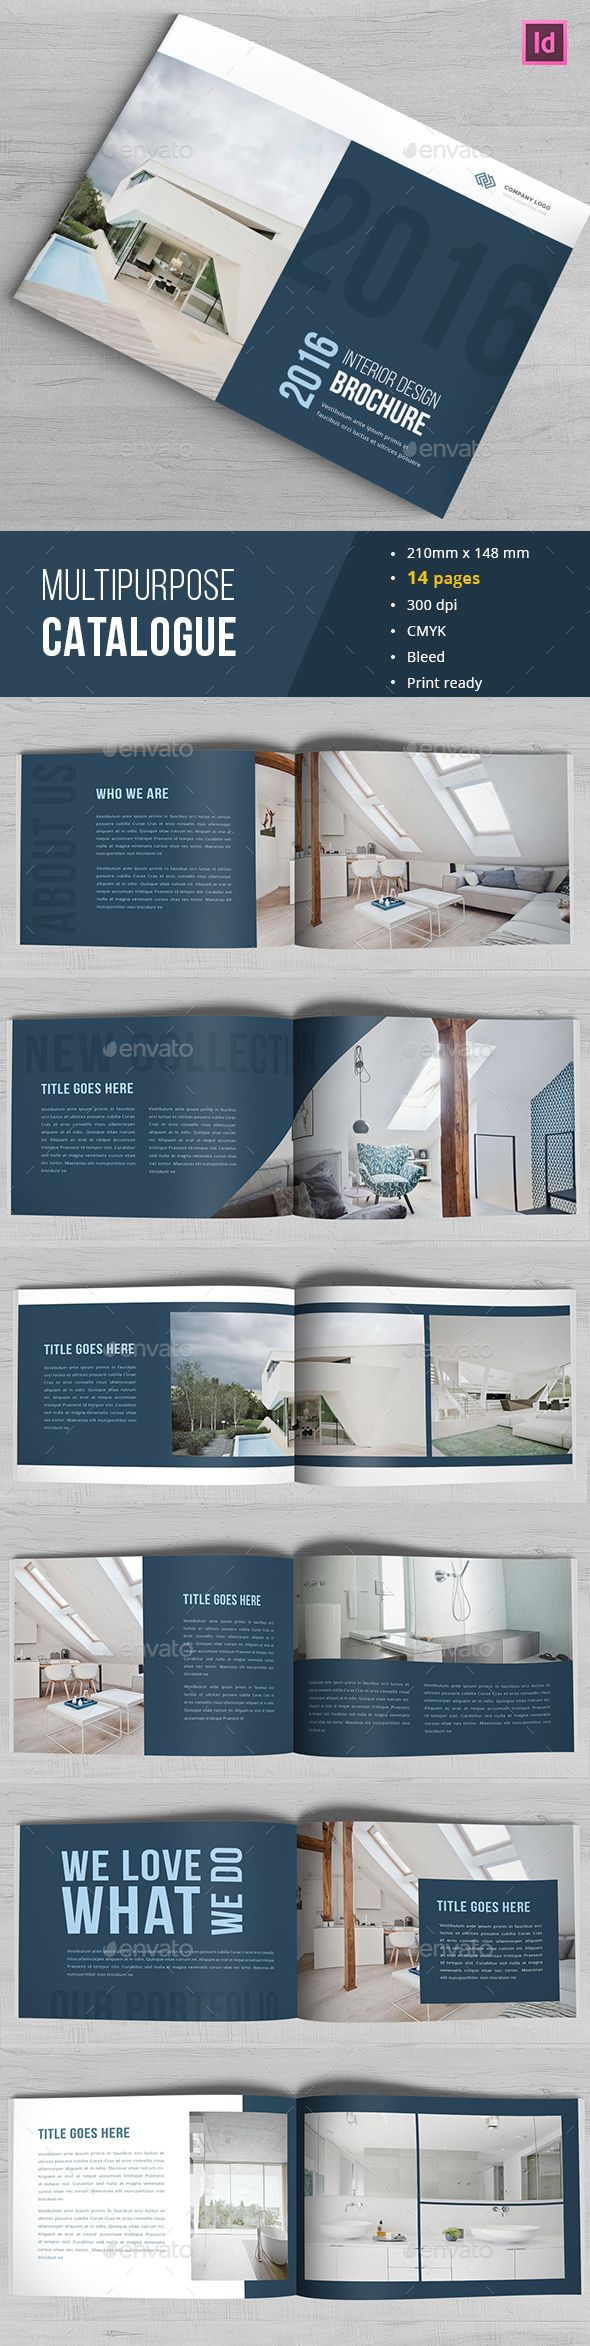 Best 25 Interior Design Portfolios Ideas On Pinterest Interior Design Resume Portfolio